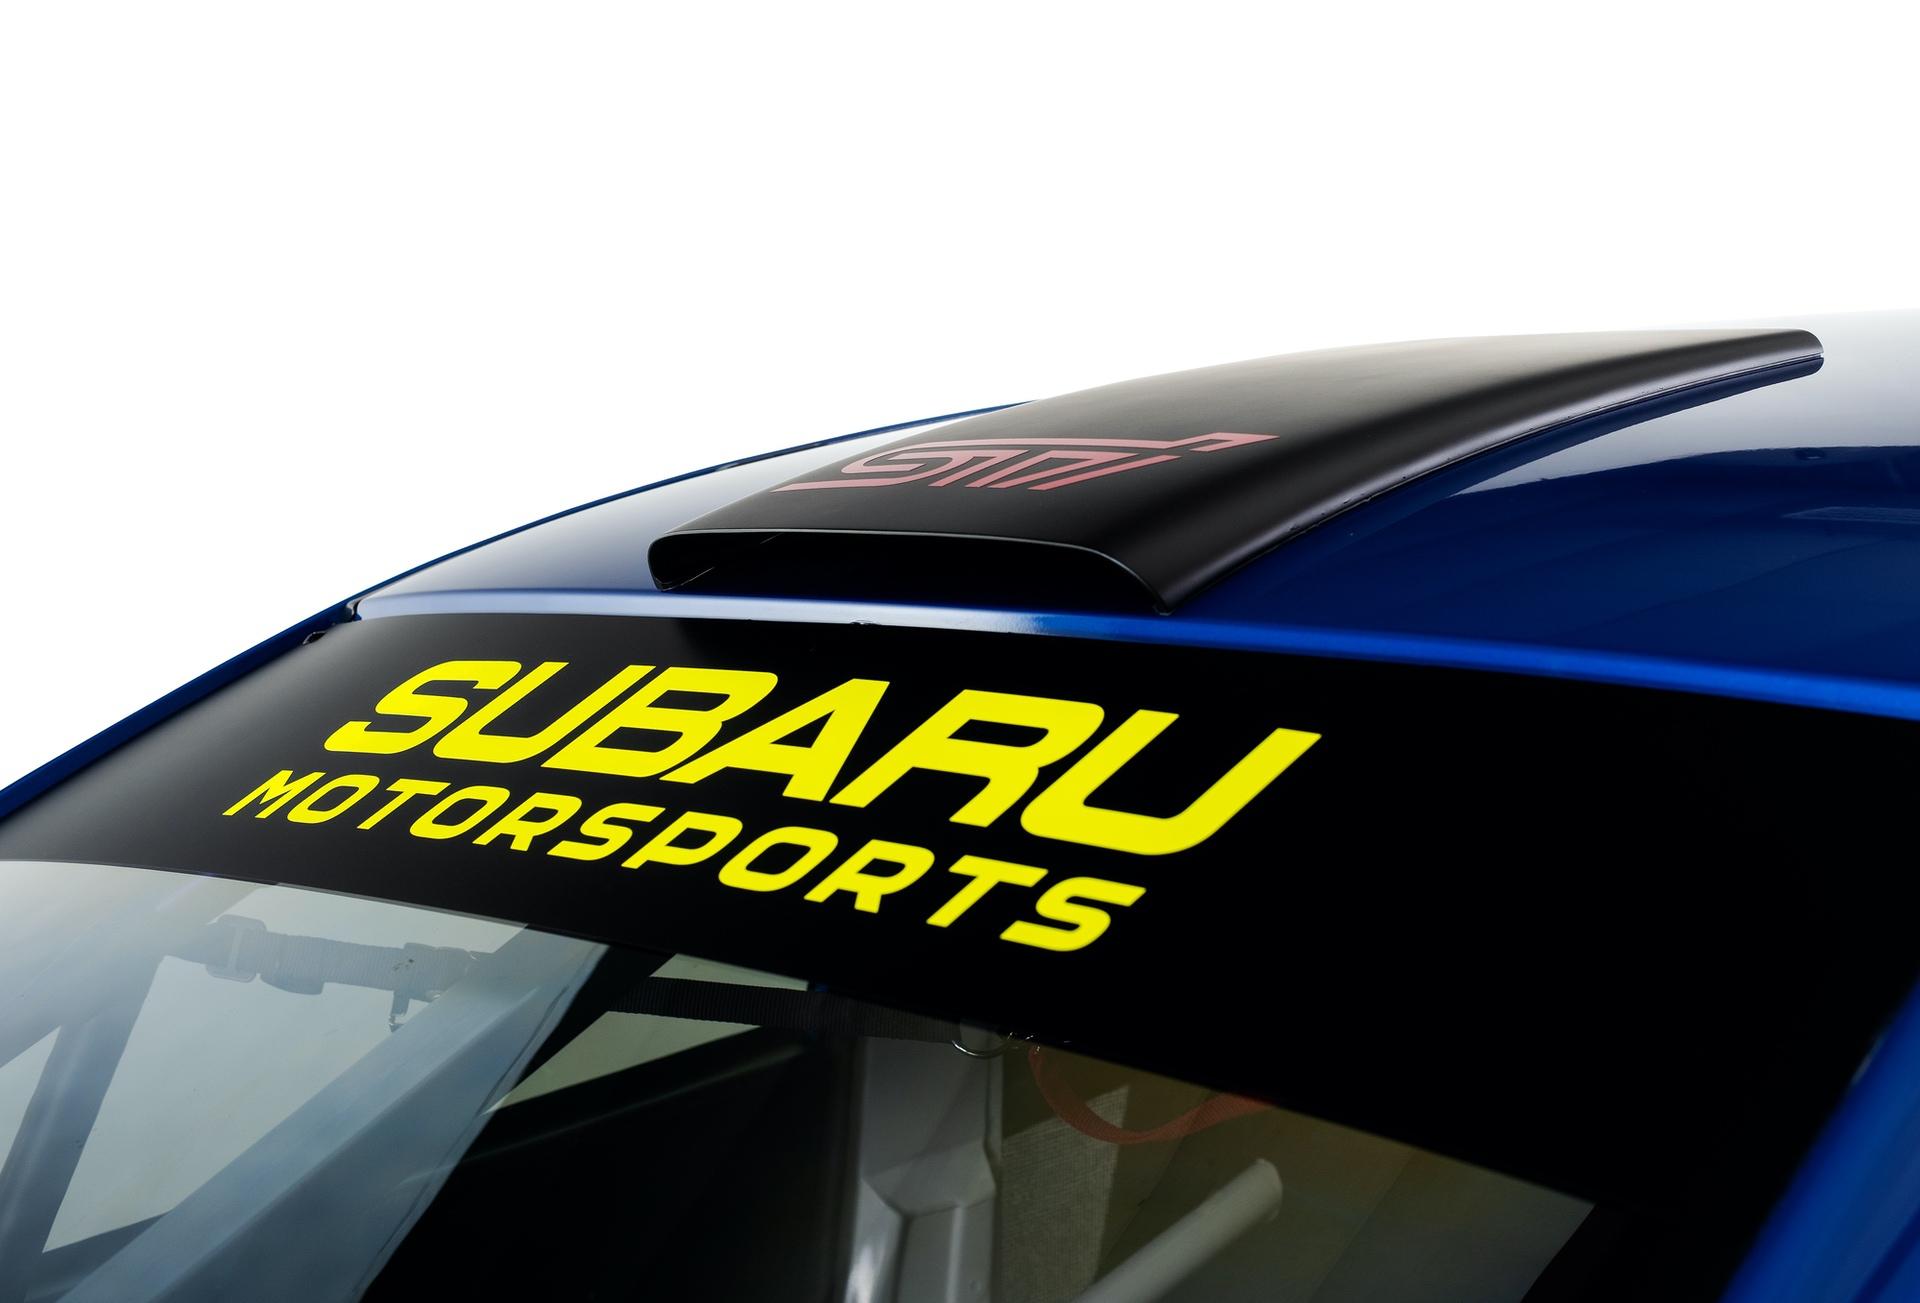 Subaru_Motorsports_livery_0000